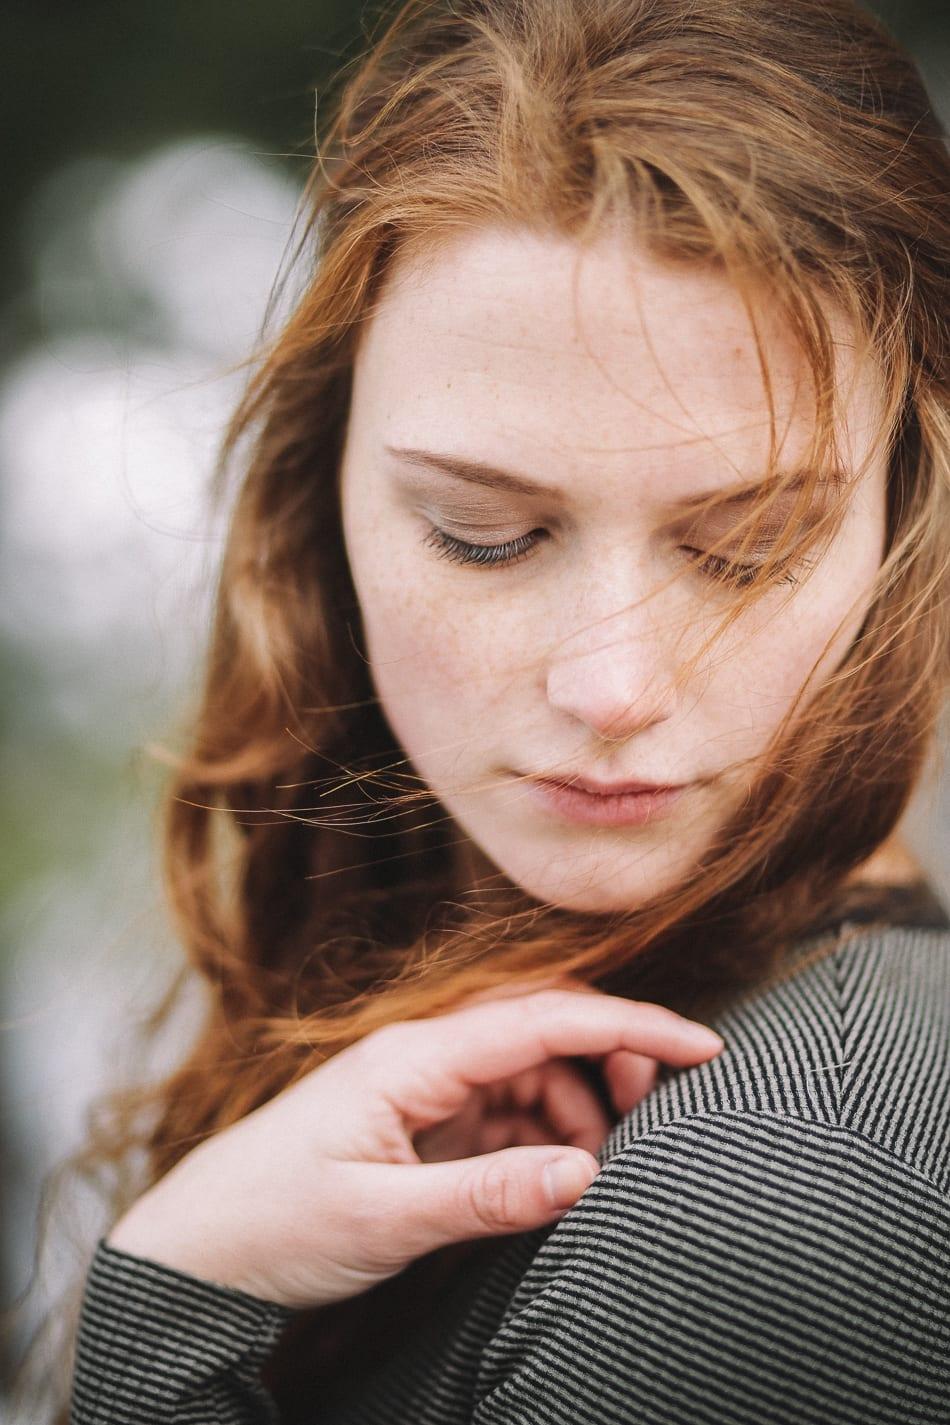 mount-lassen-winter-portrait-photo-11